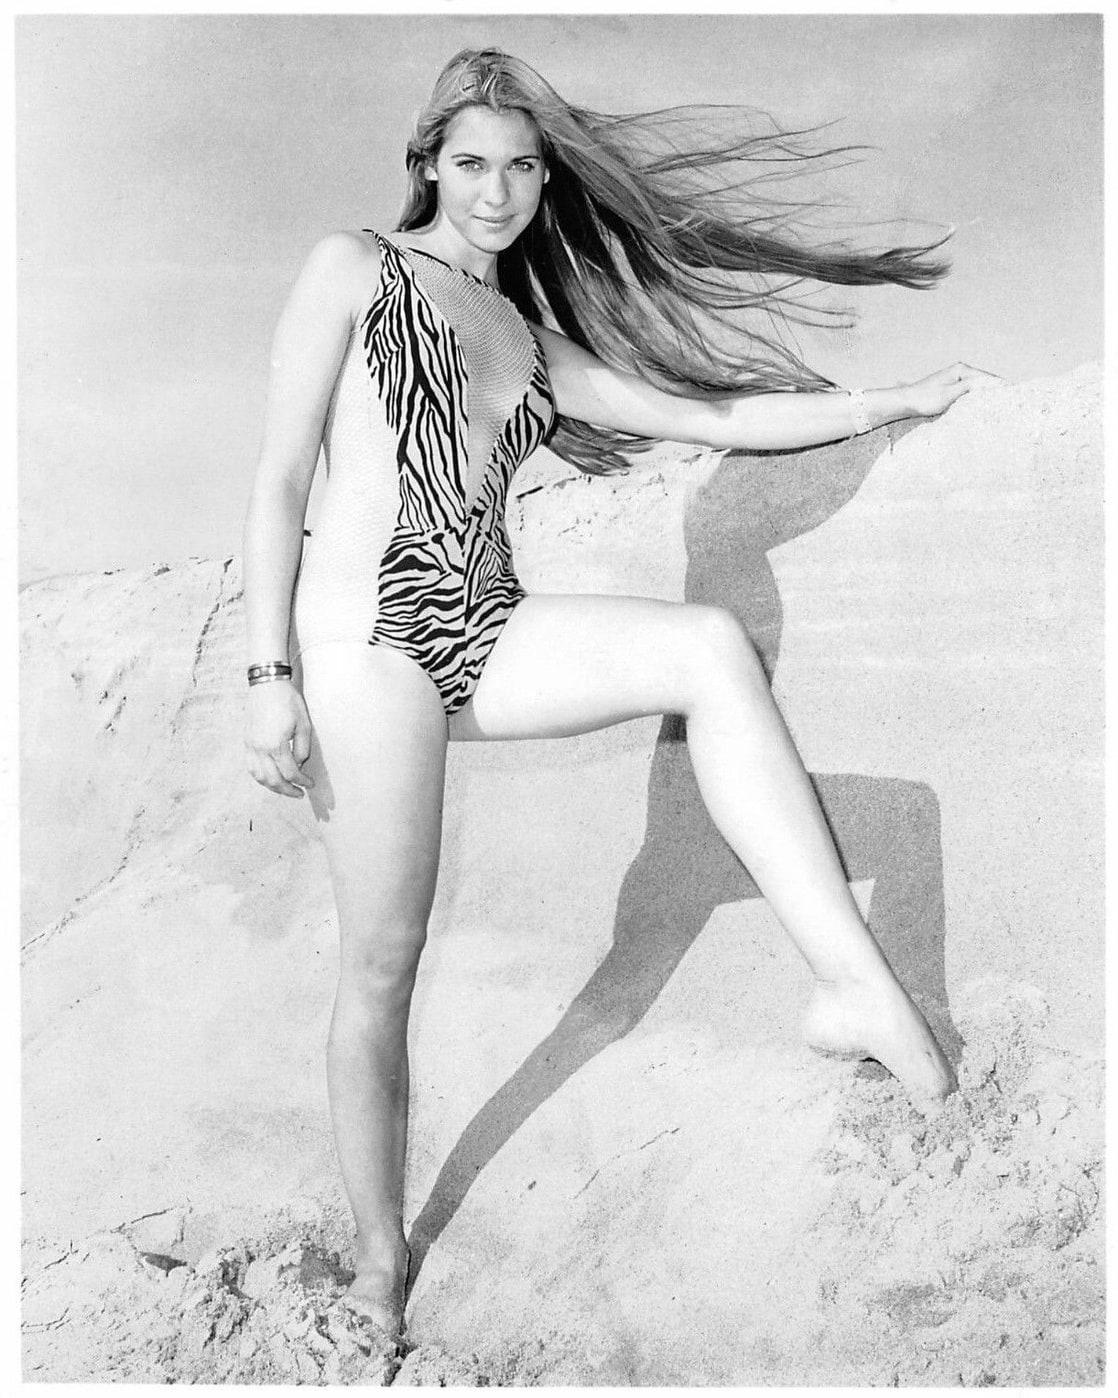 Margaret Markov nudes (48 photos), Topless, Bikini, Instagram, legs 2020